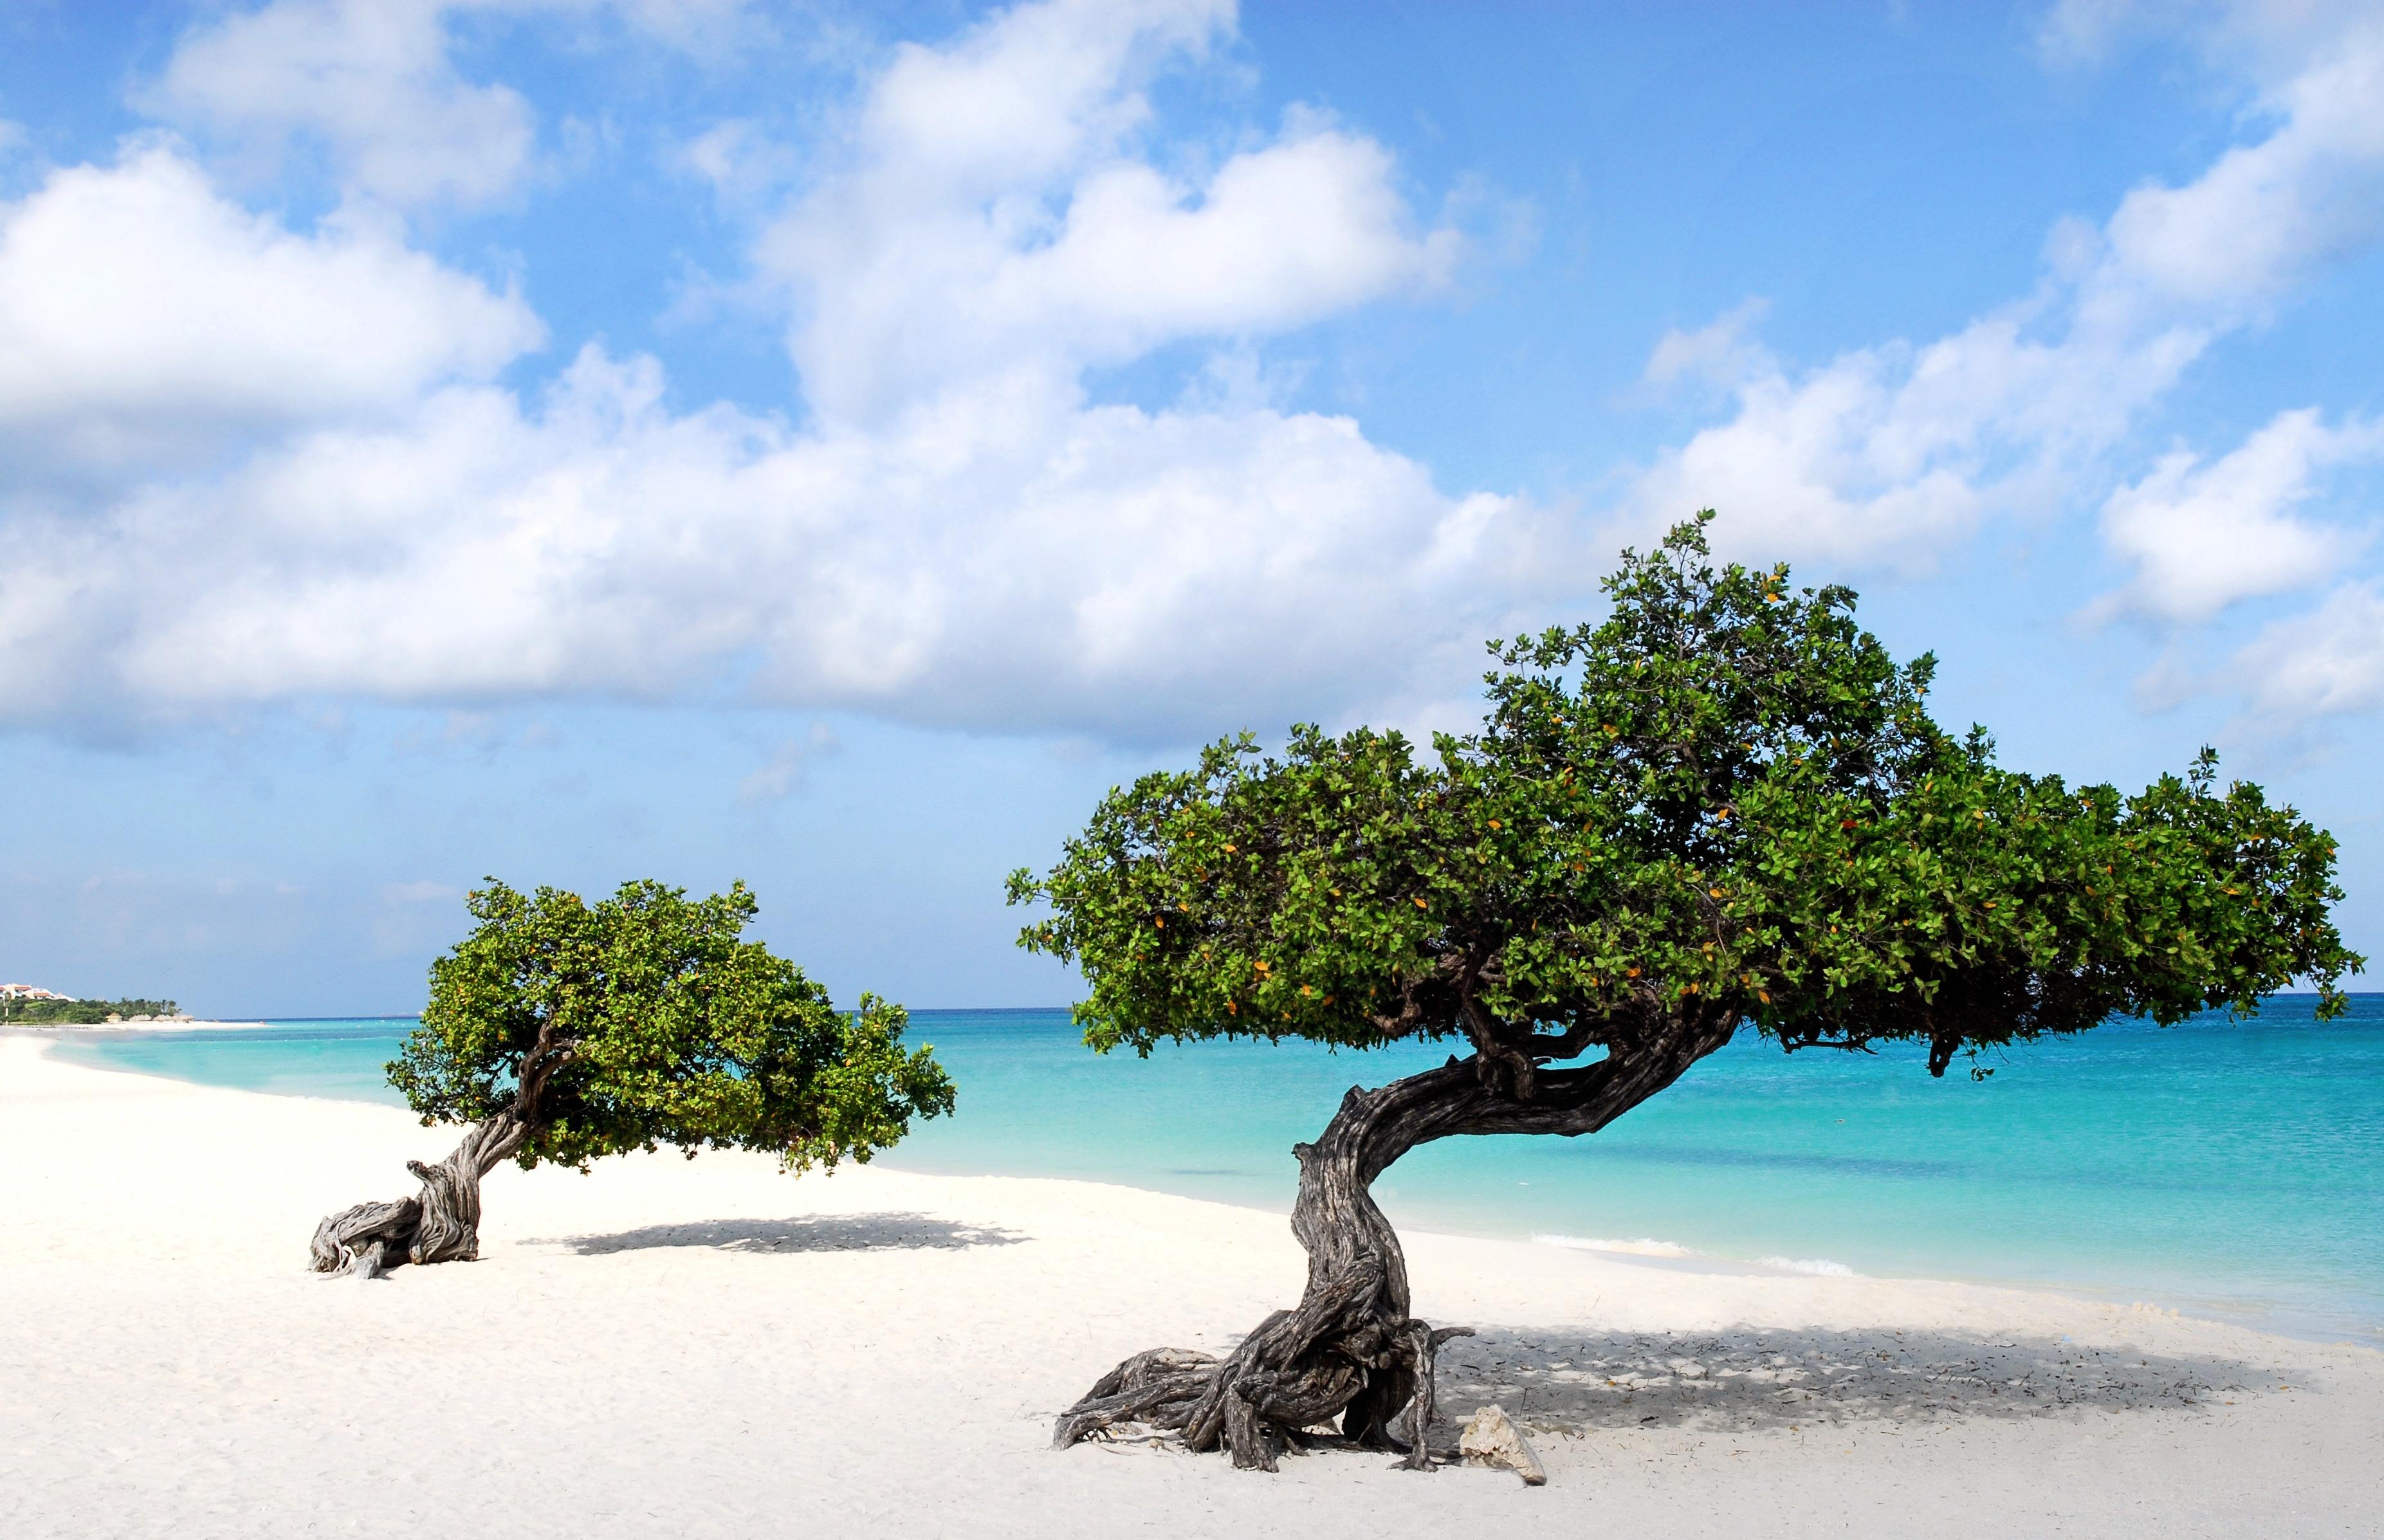 Beautiful-of-Divi-trees-in-Aruba-island-wallpaper-wp5603296